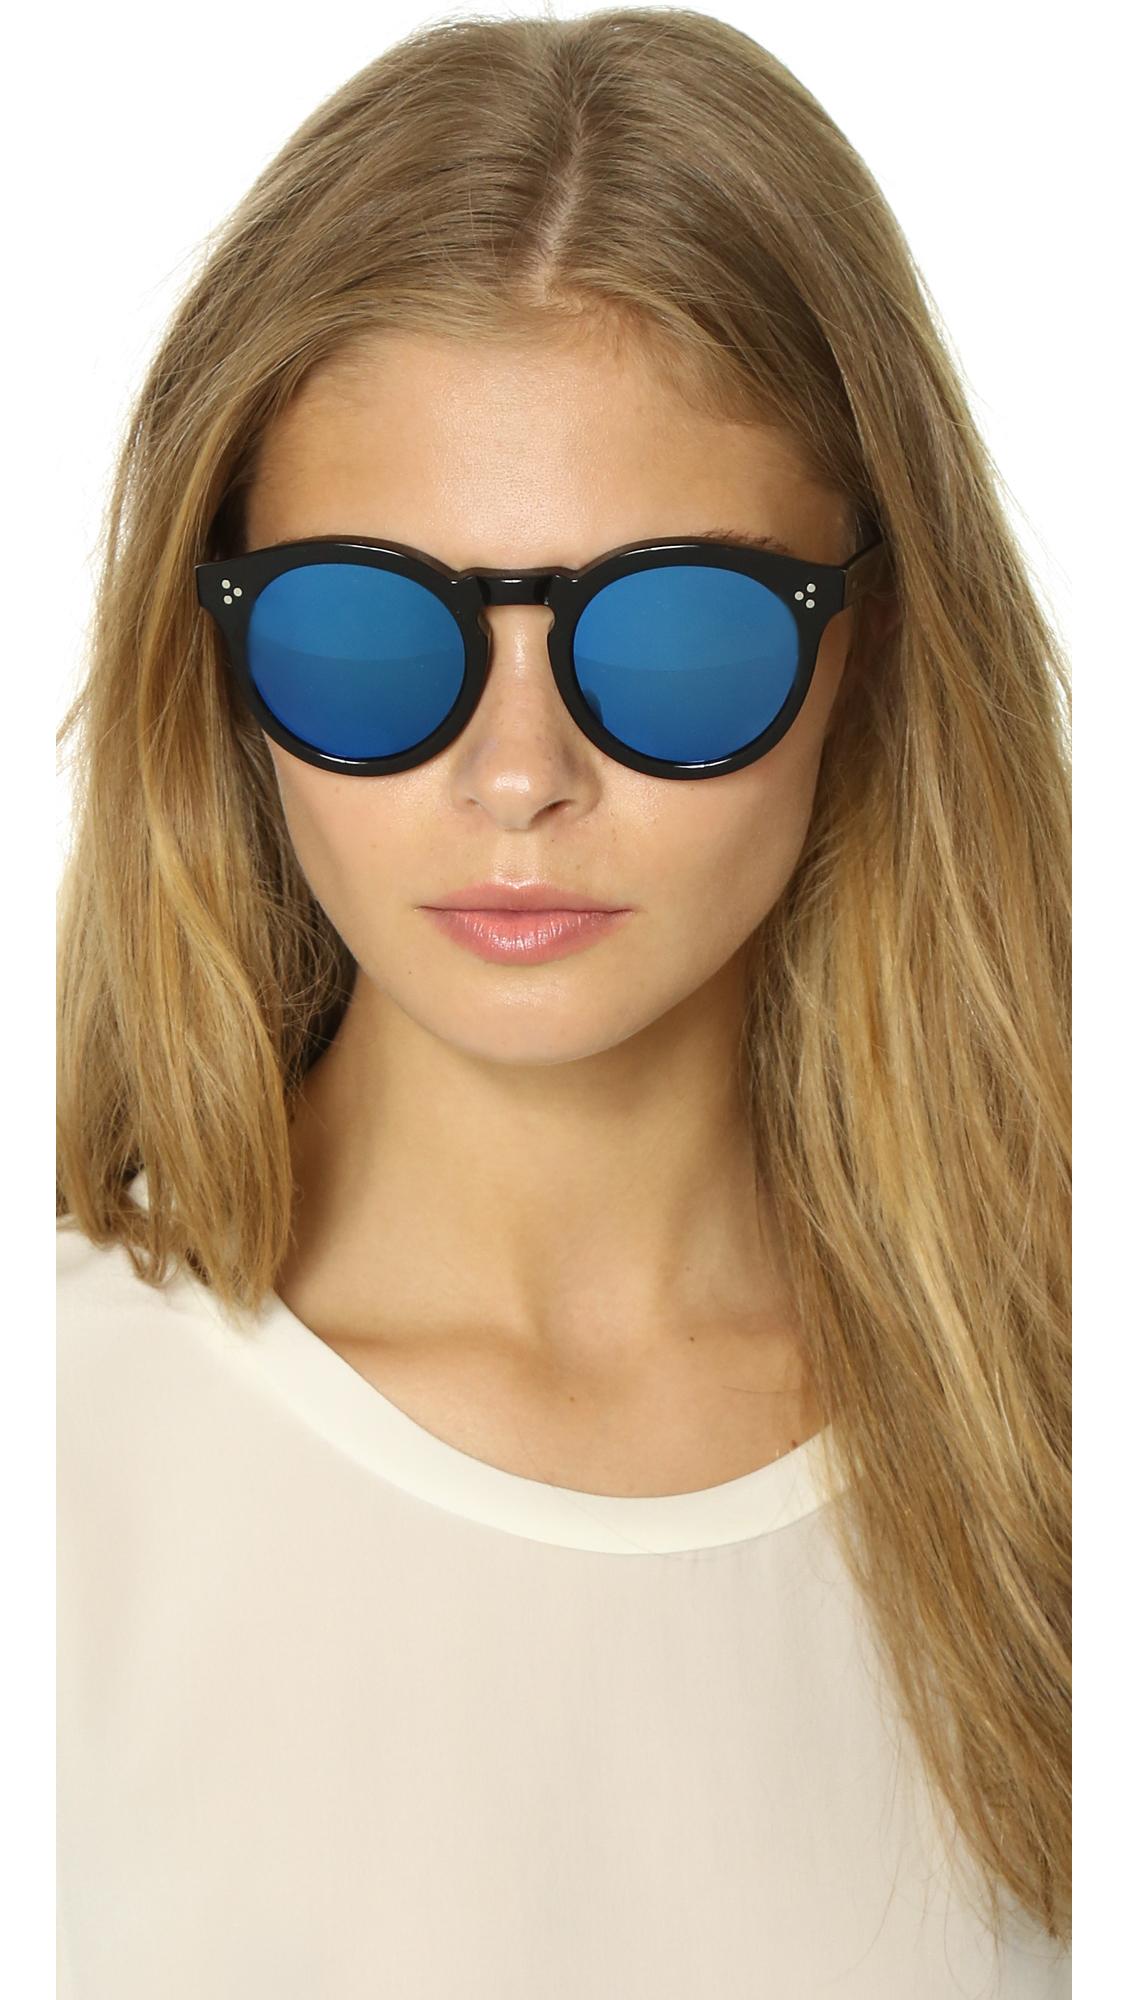 285ace852be Lyst - Illesteva Leonard Ii Mirrored Sunglasses - Black blue in Blue